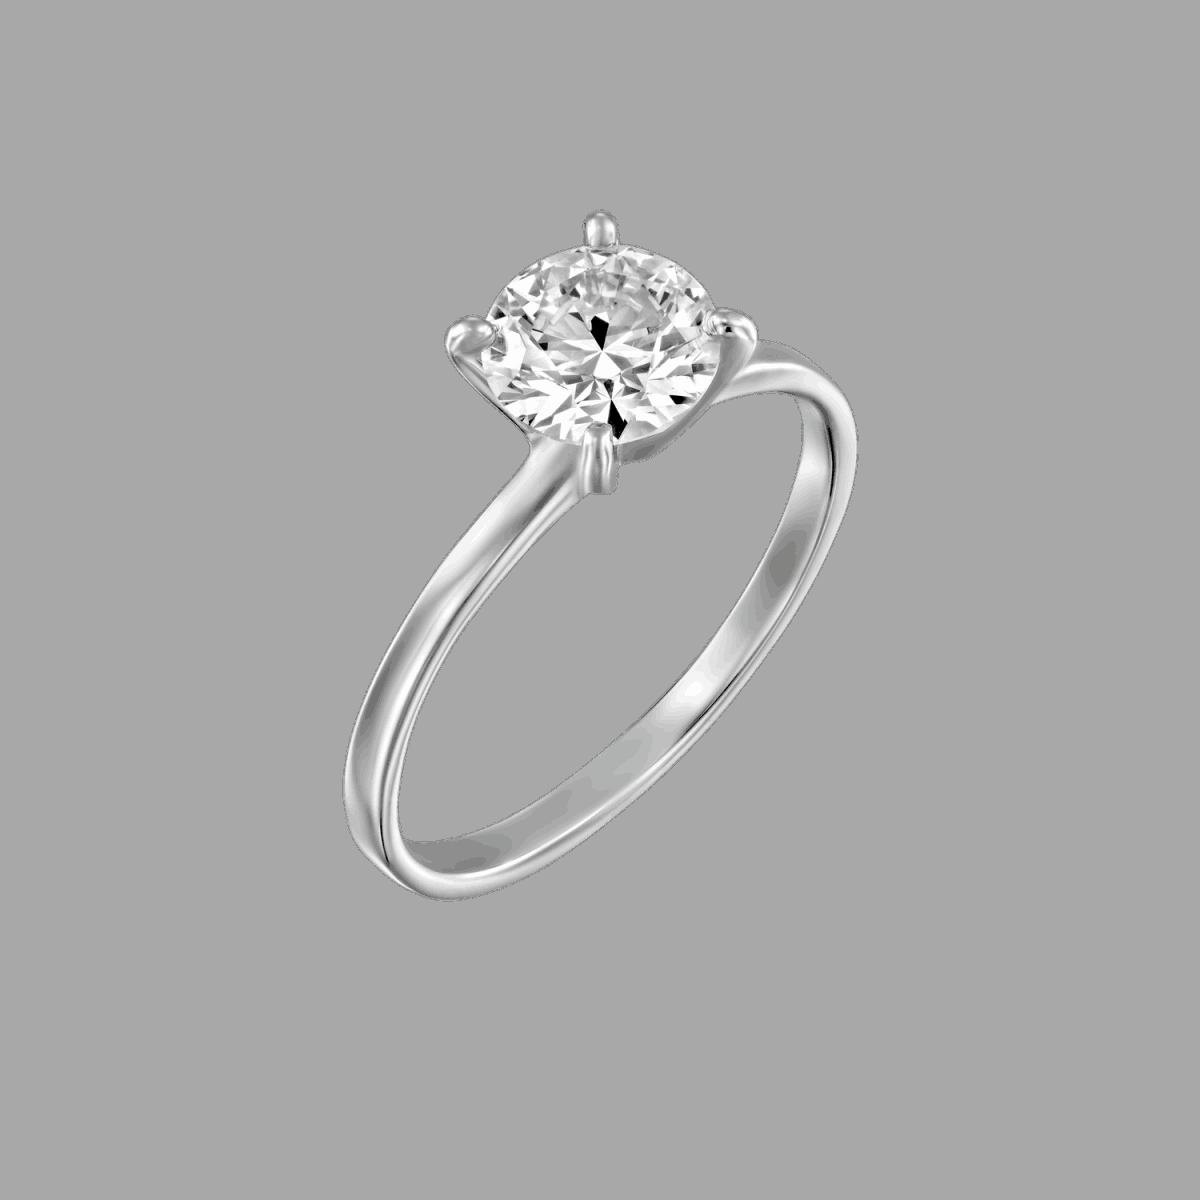 טבעת יהלום סוליטר 0.51 אנה קראט D-VS2